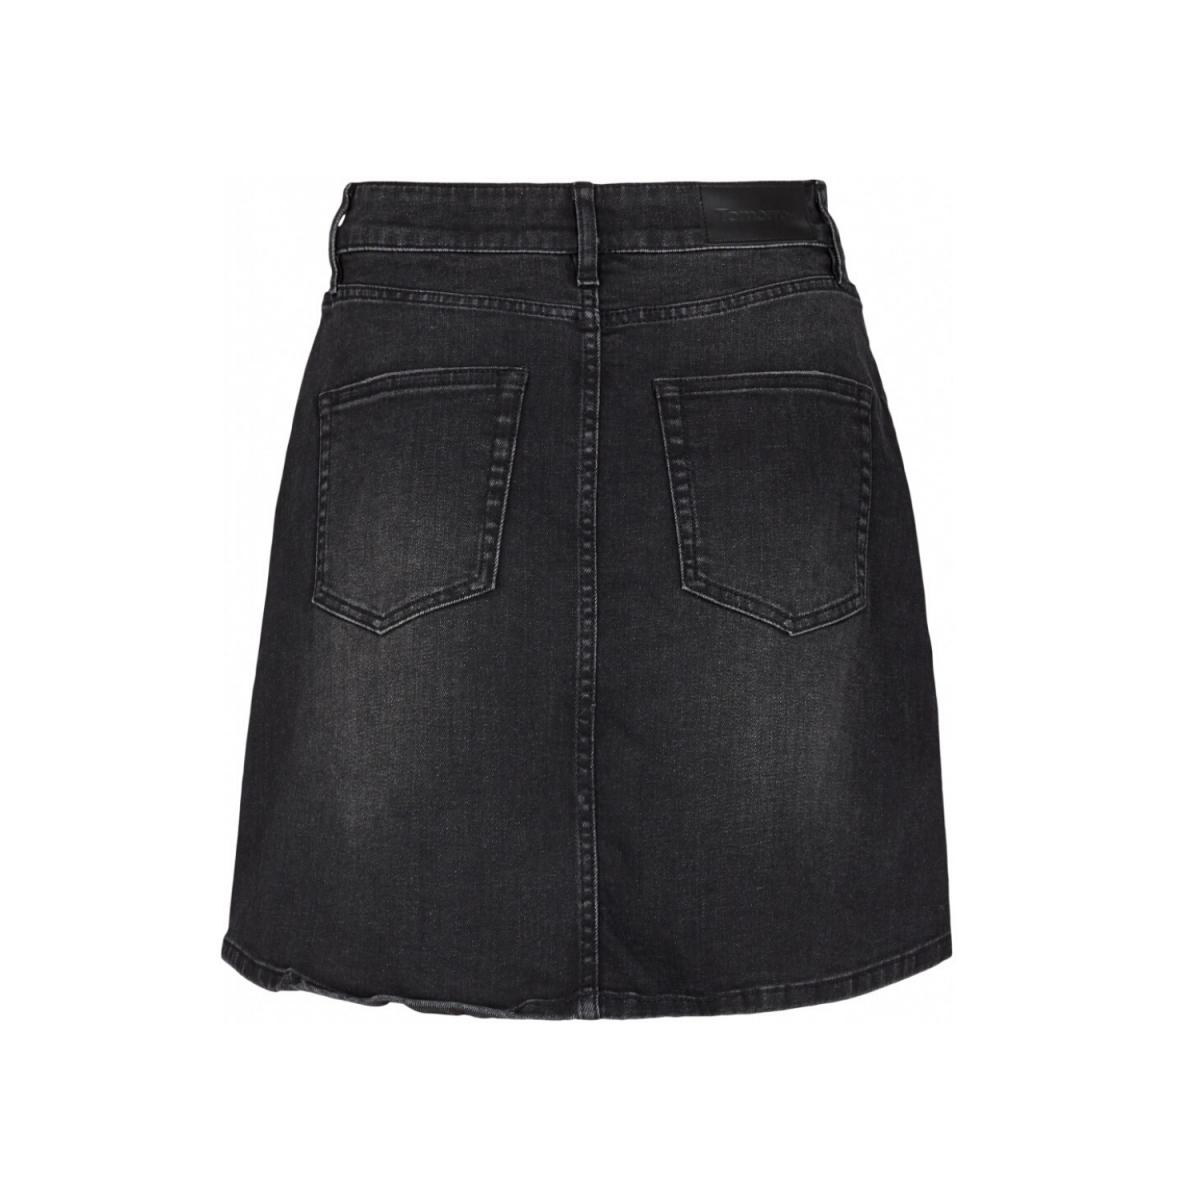 mandela denim skirt original - black - bag